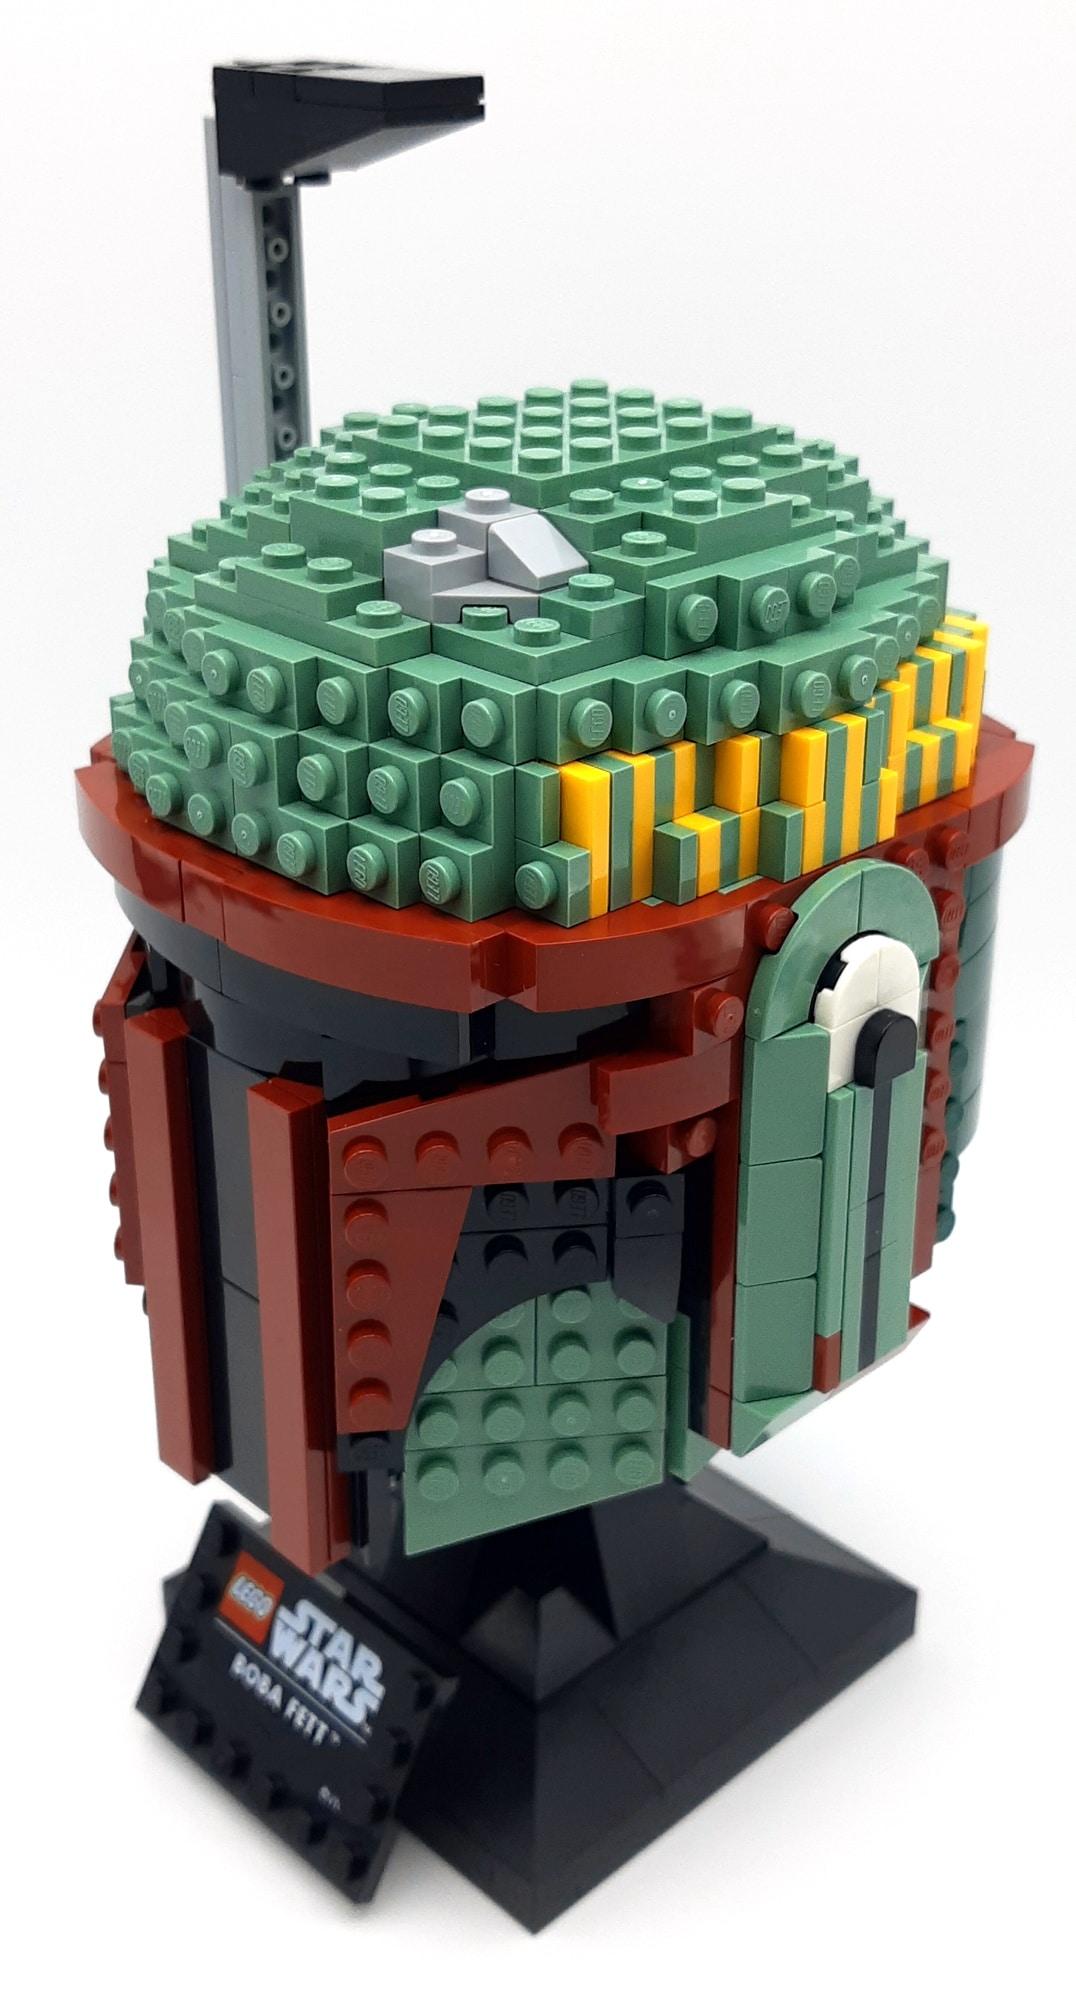 LEGO 75277 Boba Fett Helm 2